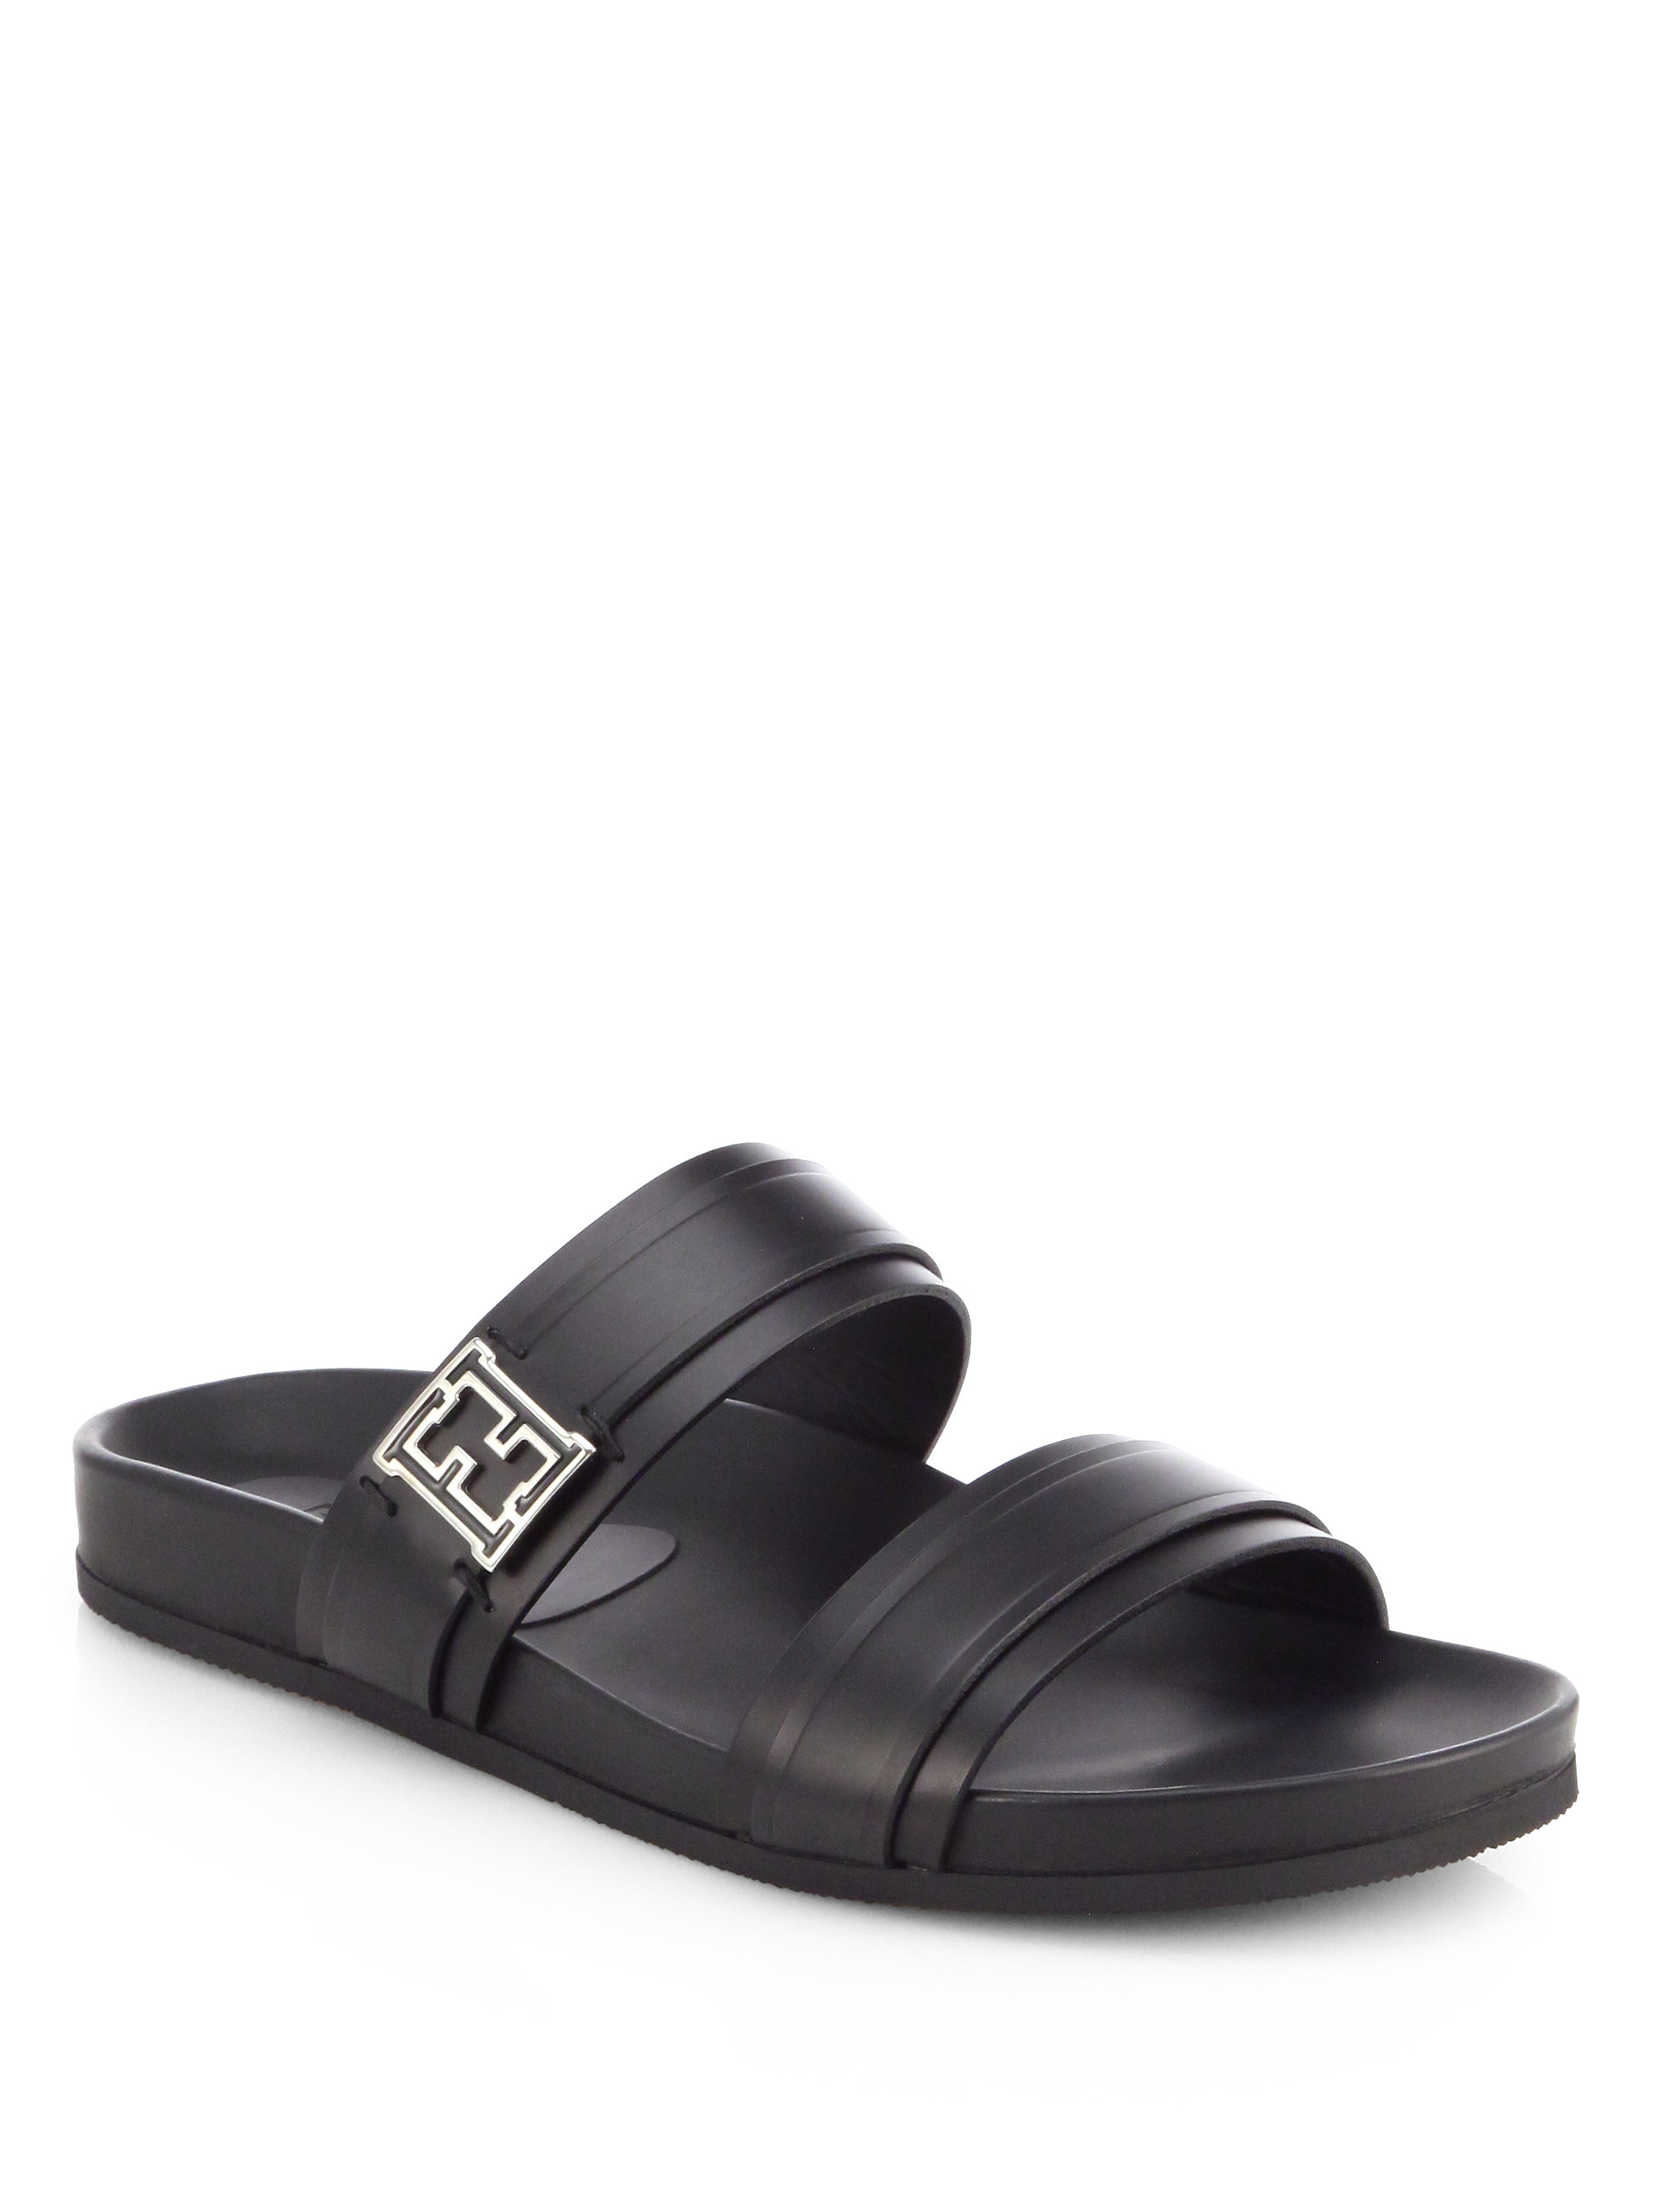 Sandales Chaussures Hommes Fendi iQ4LqA6